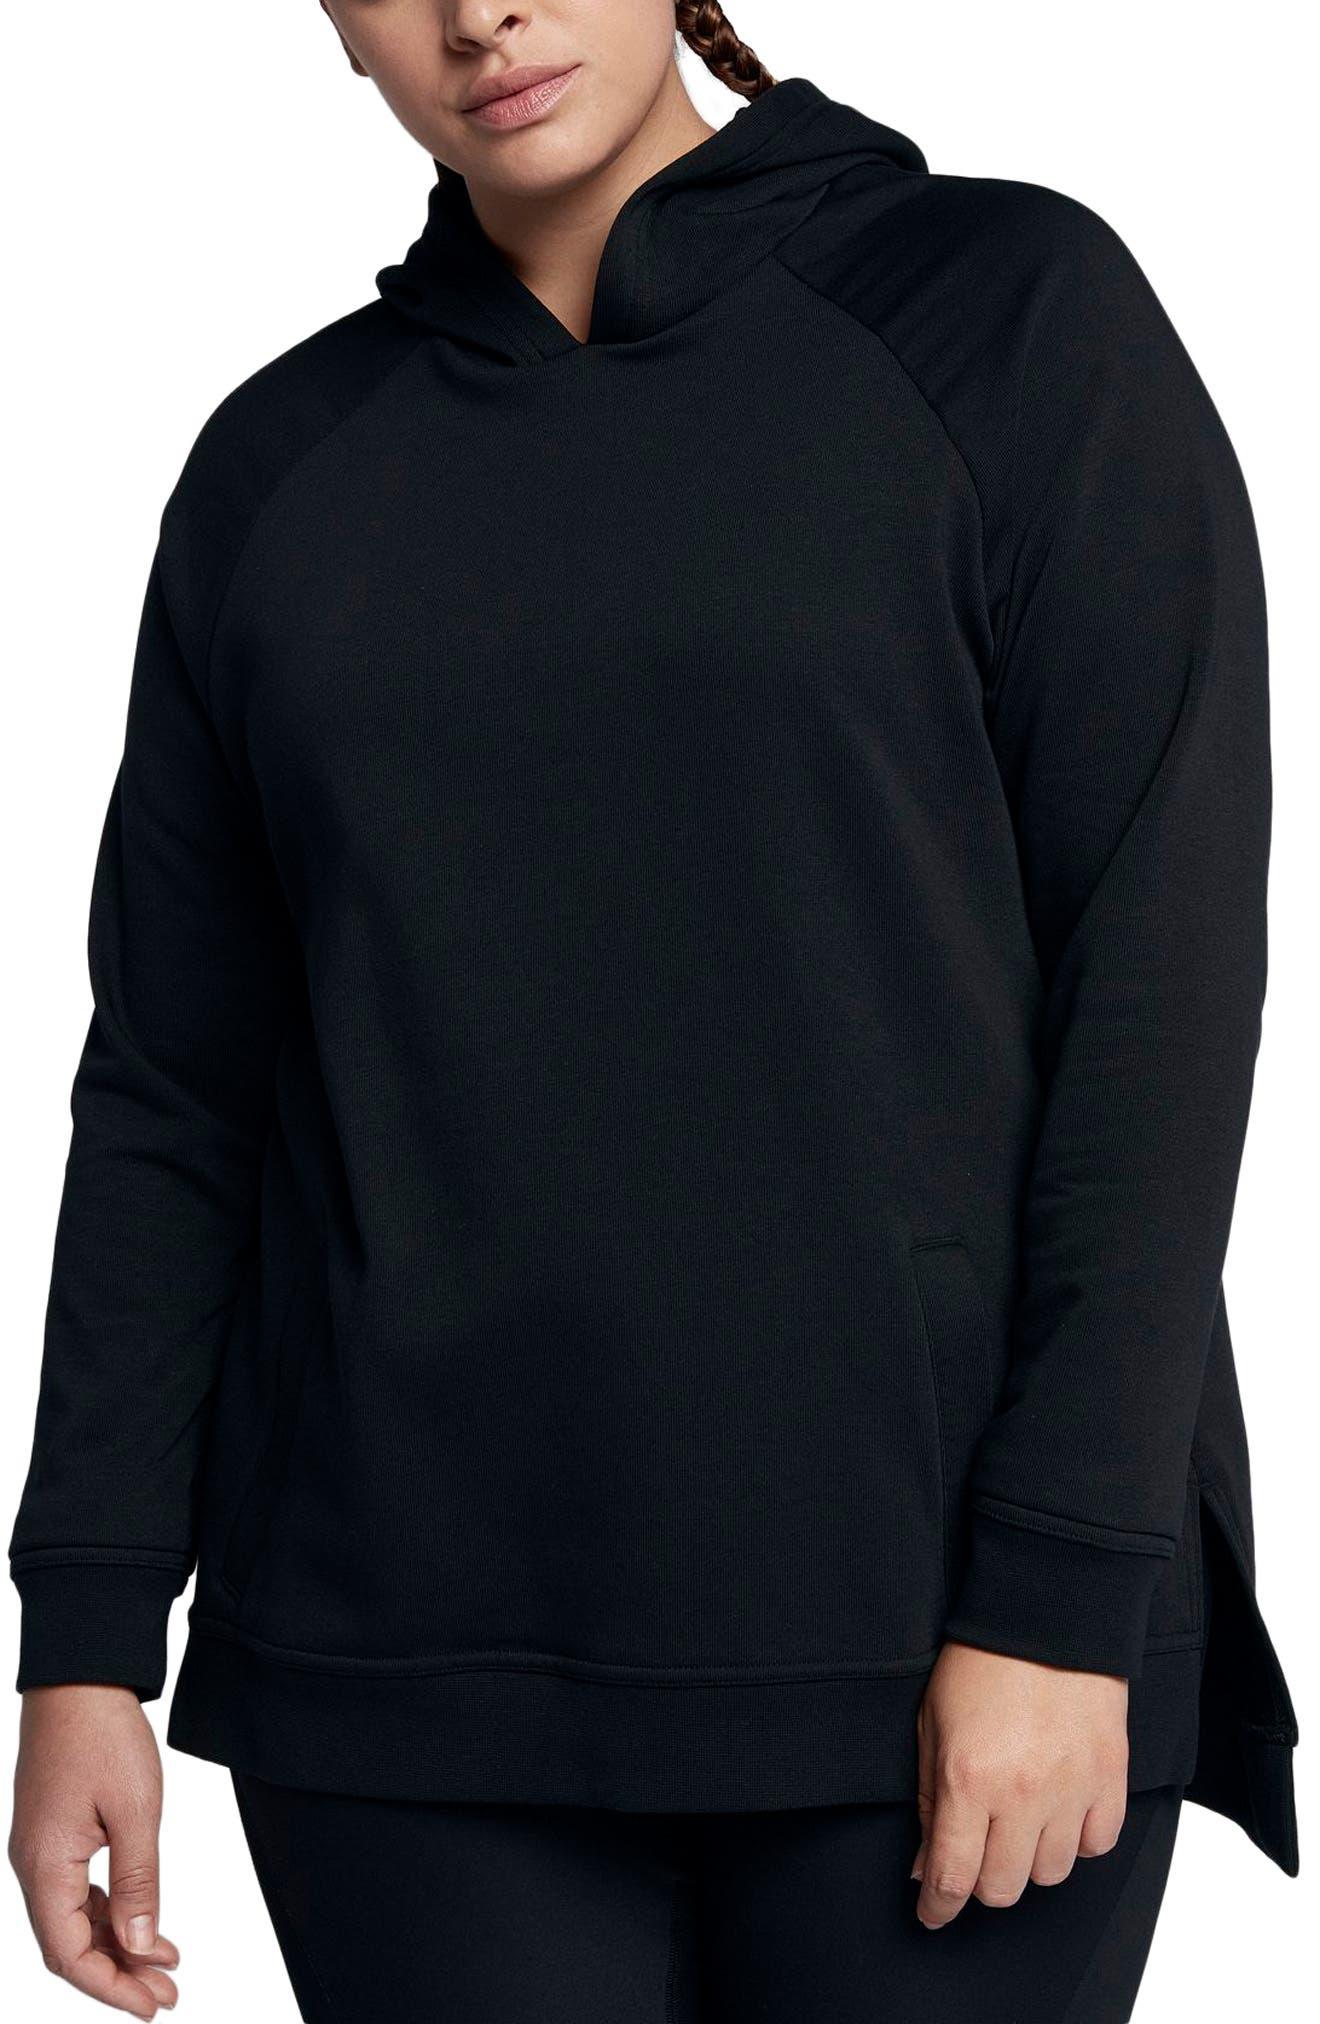 Dry Training Hoodie,                         Main,                         color, Black/ White